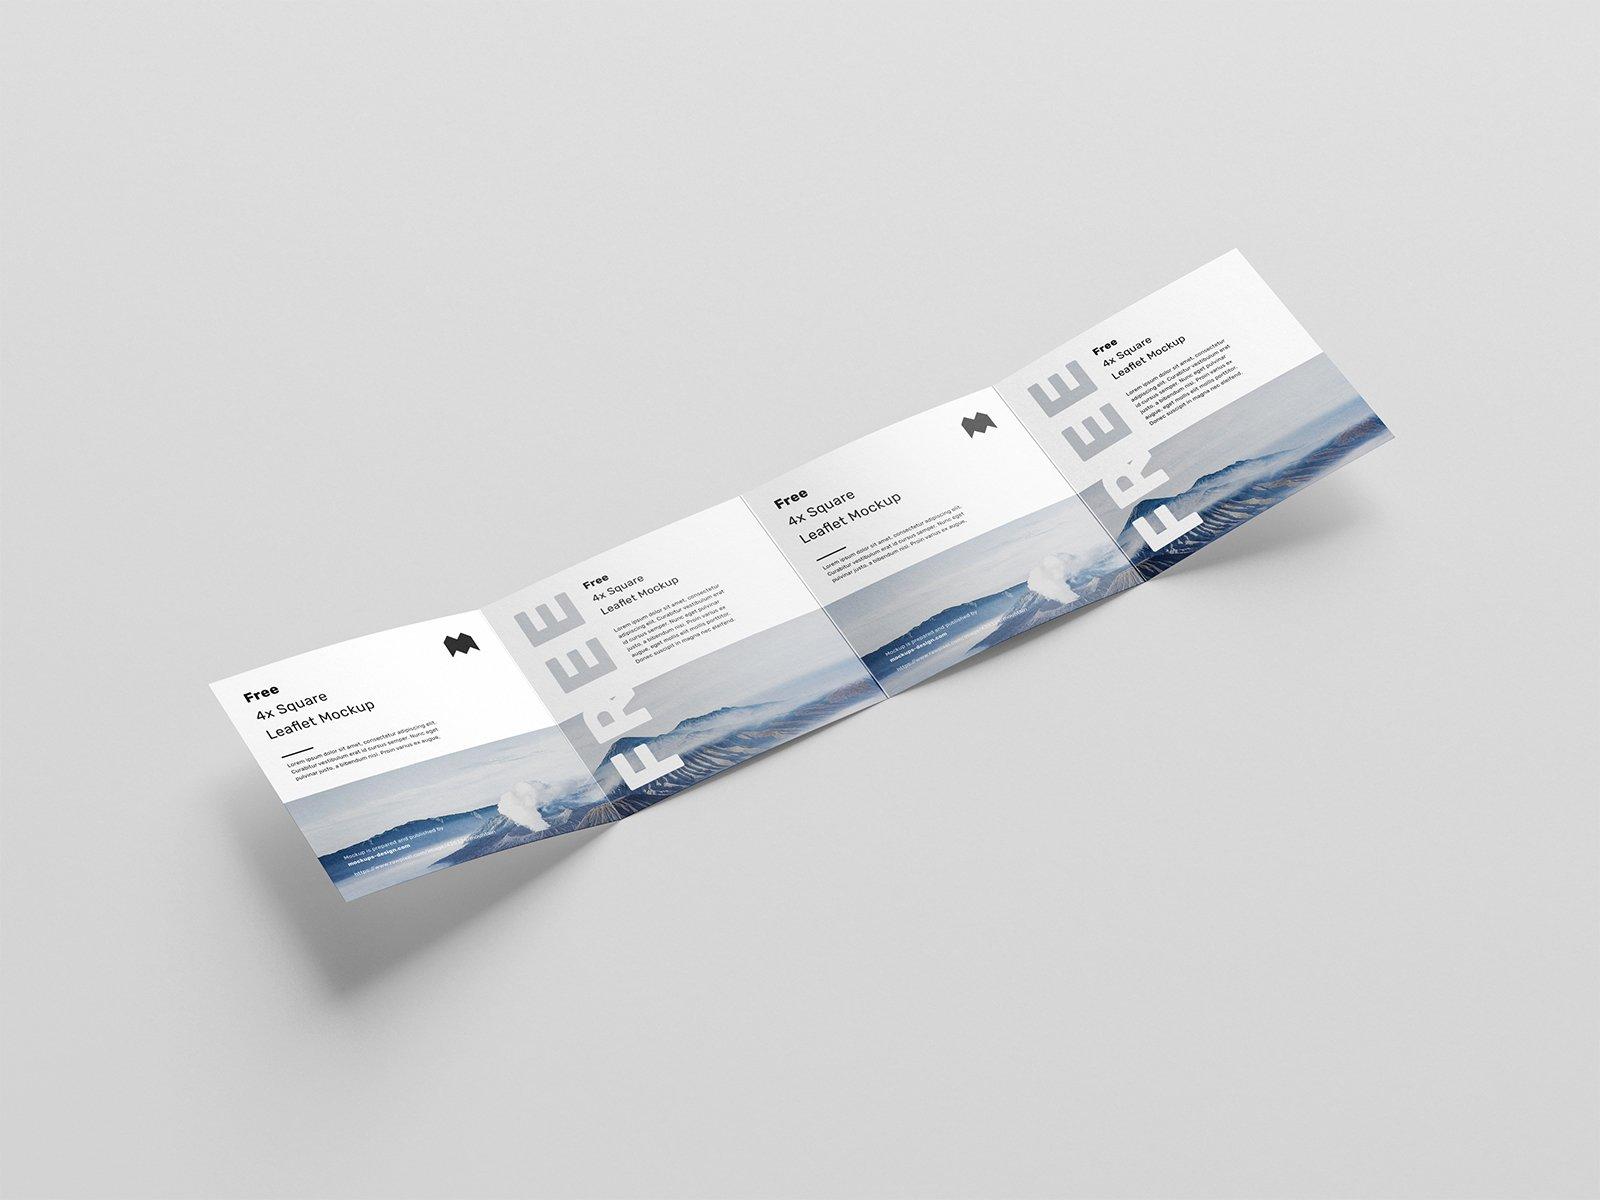 Mockup Psd Free Business Card